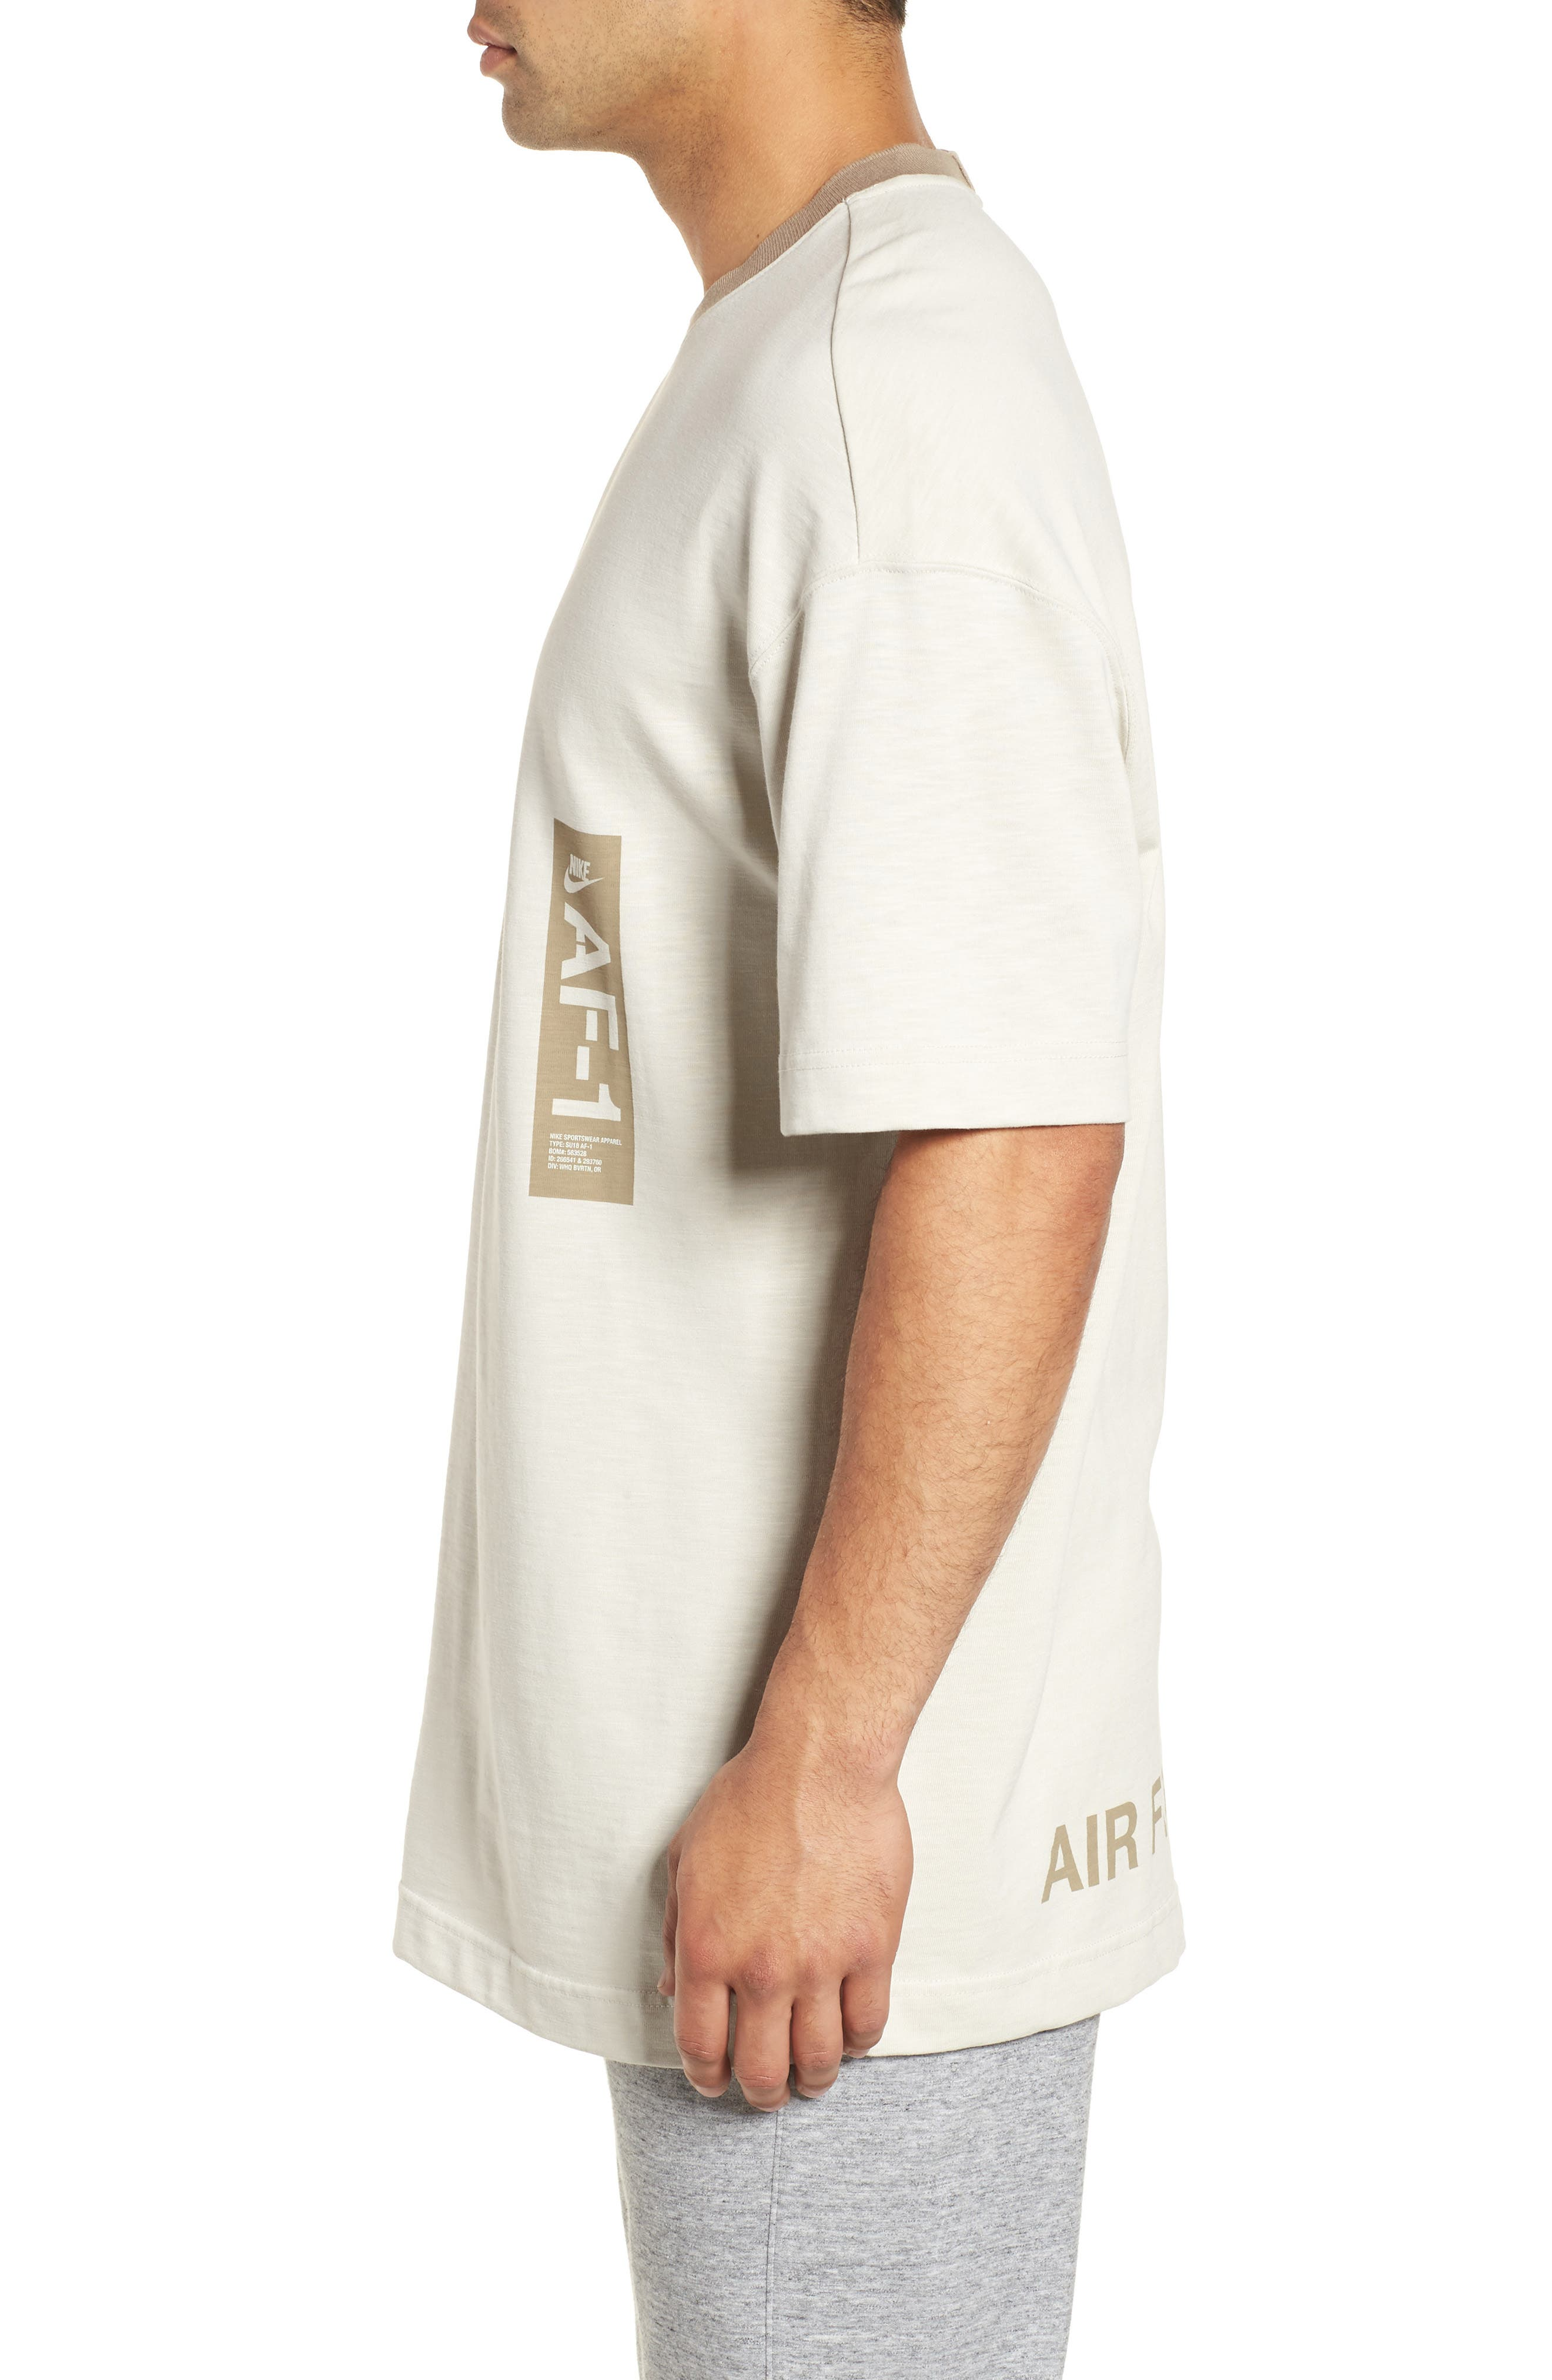 Sportswear AF1 Graphic T-Shirt,                             Alternate thumbnail 3, color,                             LIGHT BONE/ KHAKI